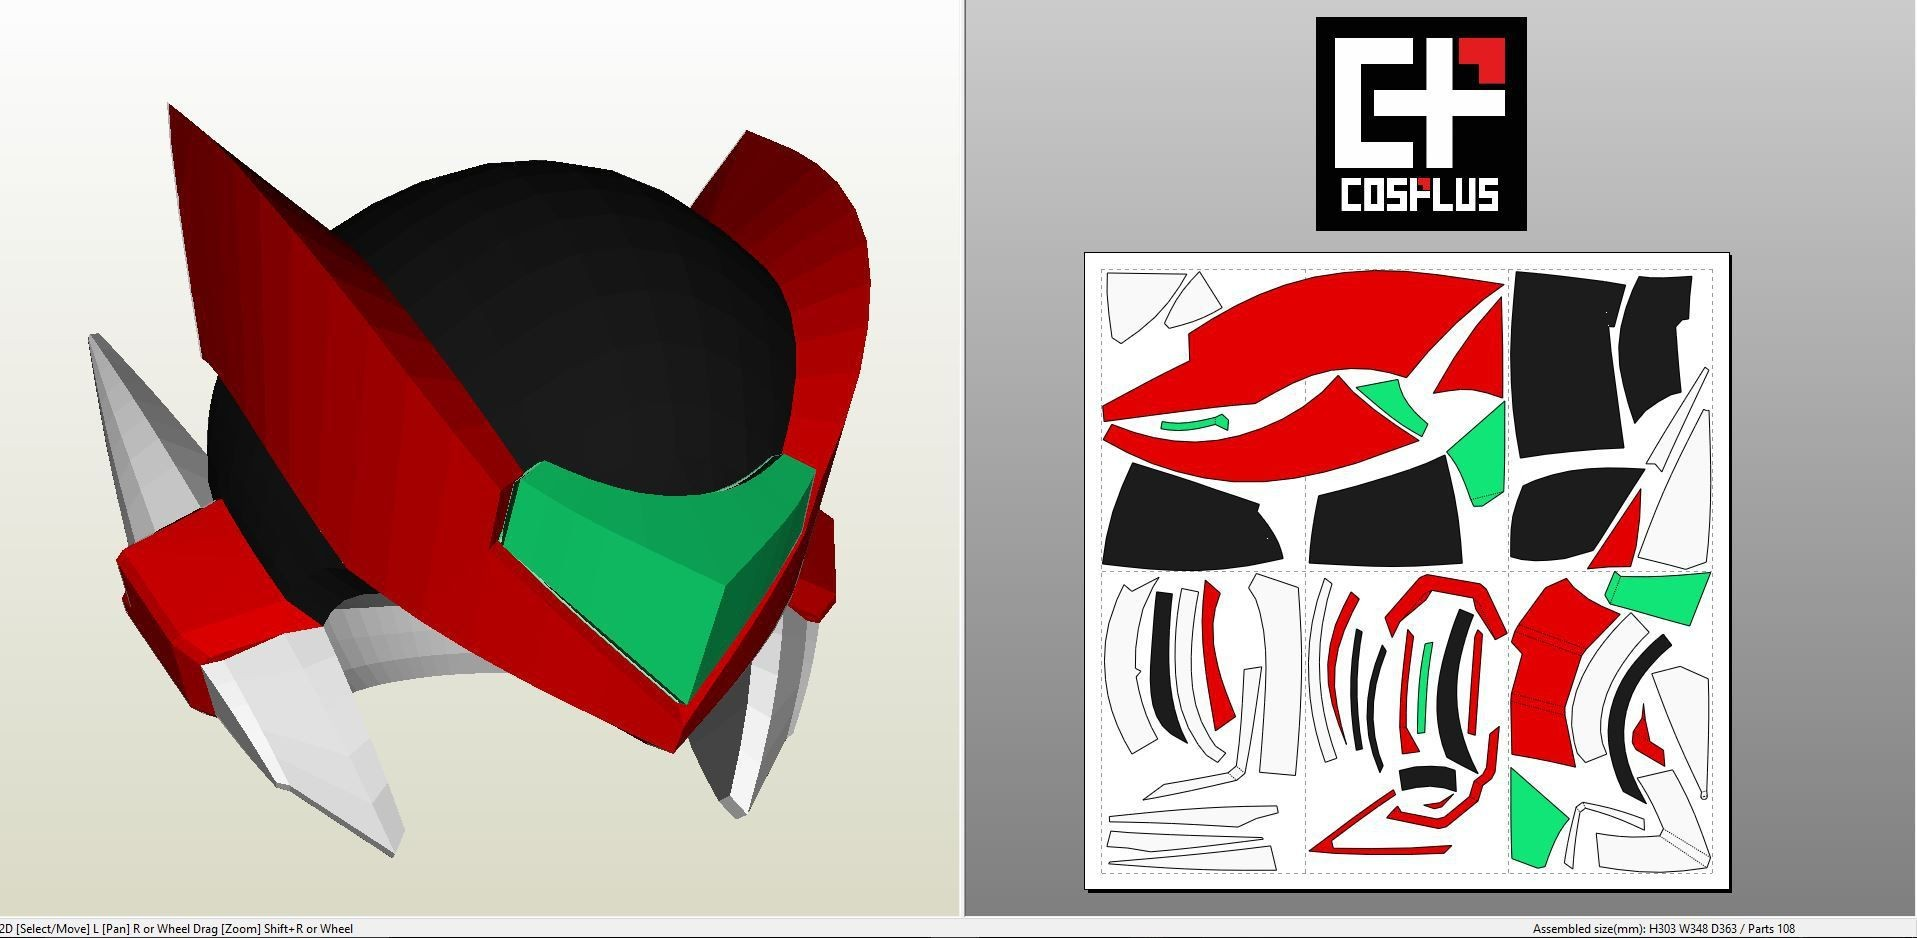 Hatsune Miku Papercraft Papercraft Pdo File Template for Megaman Zero Helmet Foam